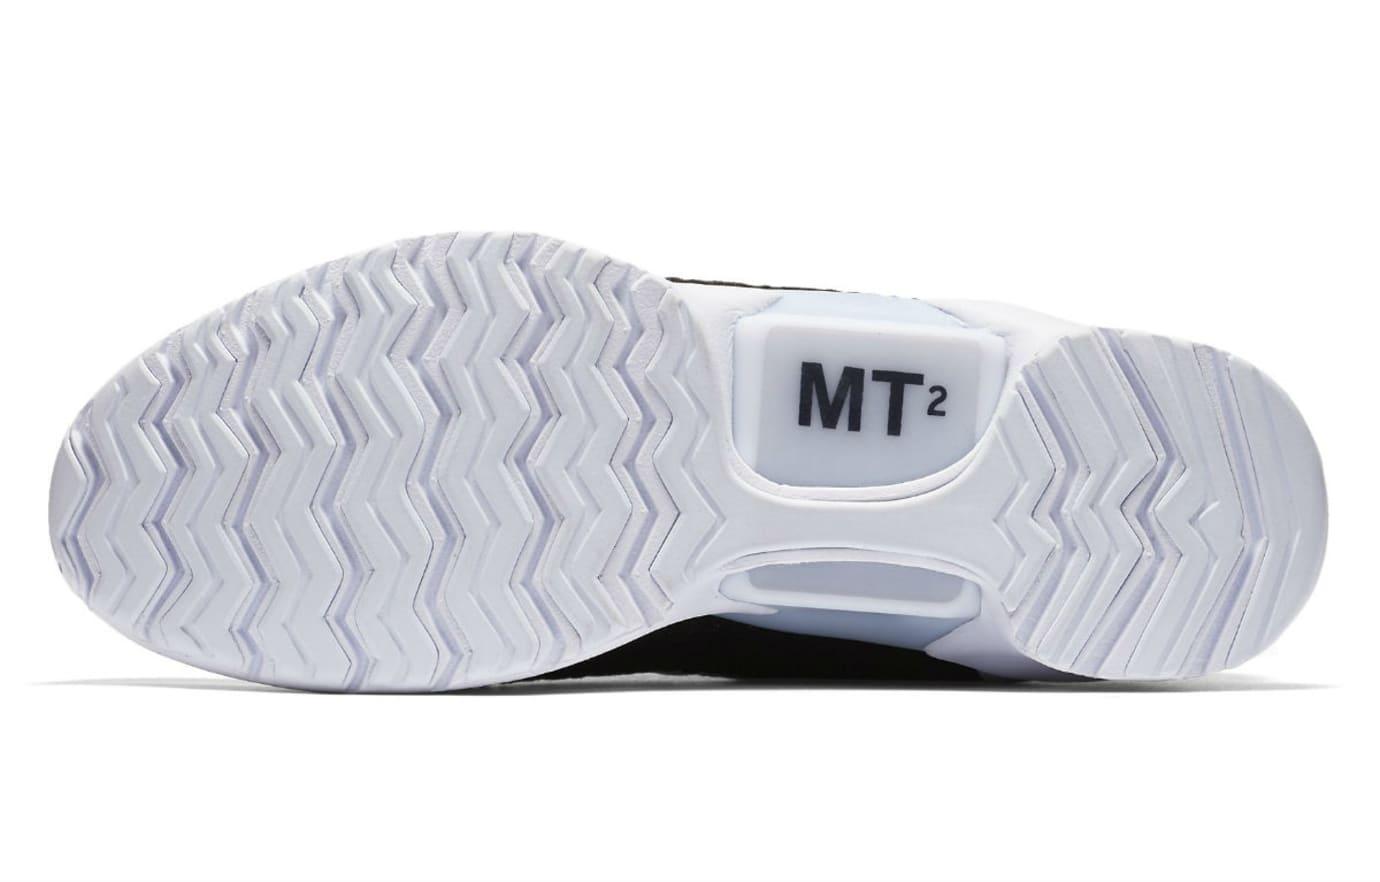 Nike HyperAdapt 1.0 Black/White Release Date AH9389-011 Sole